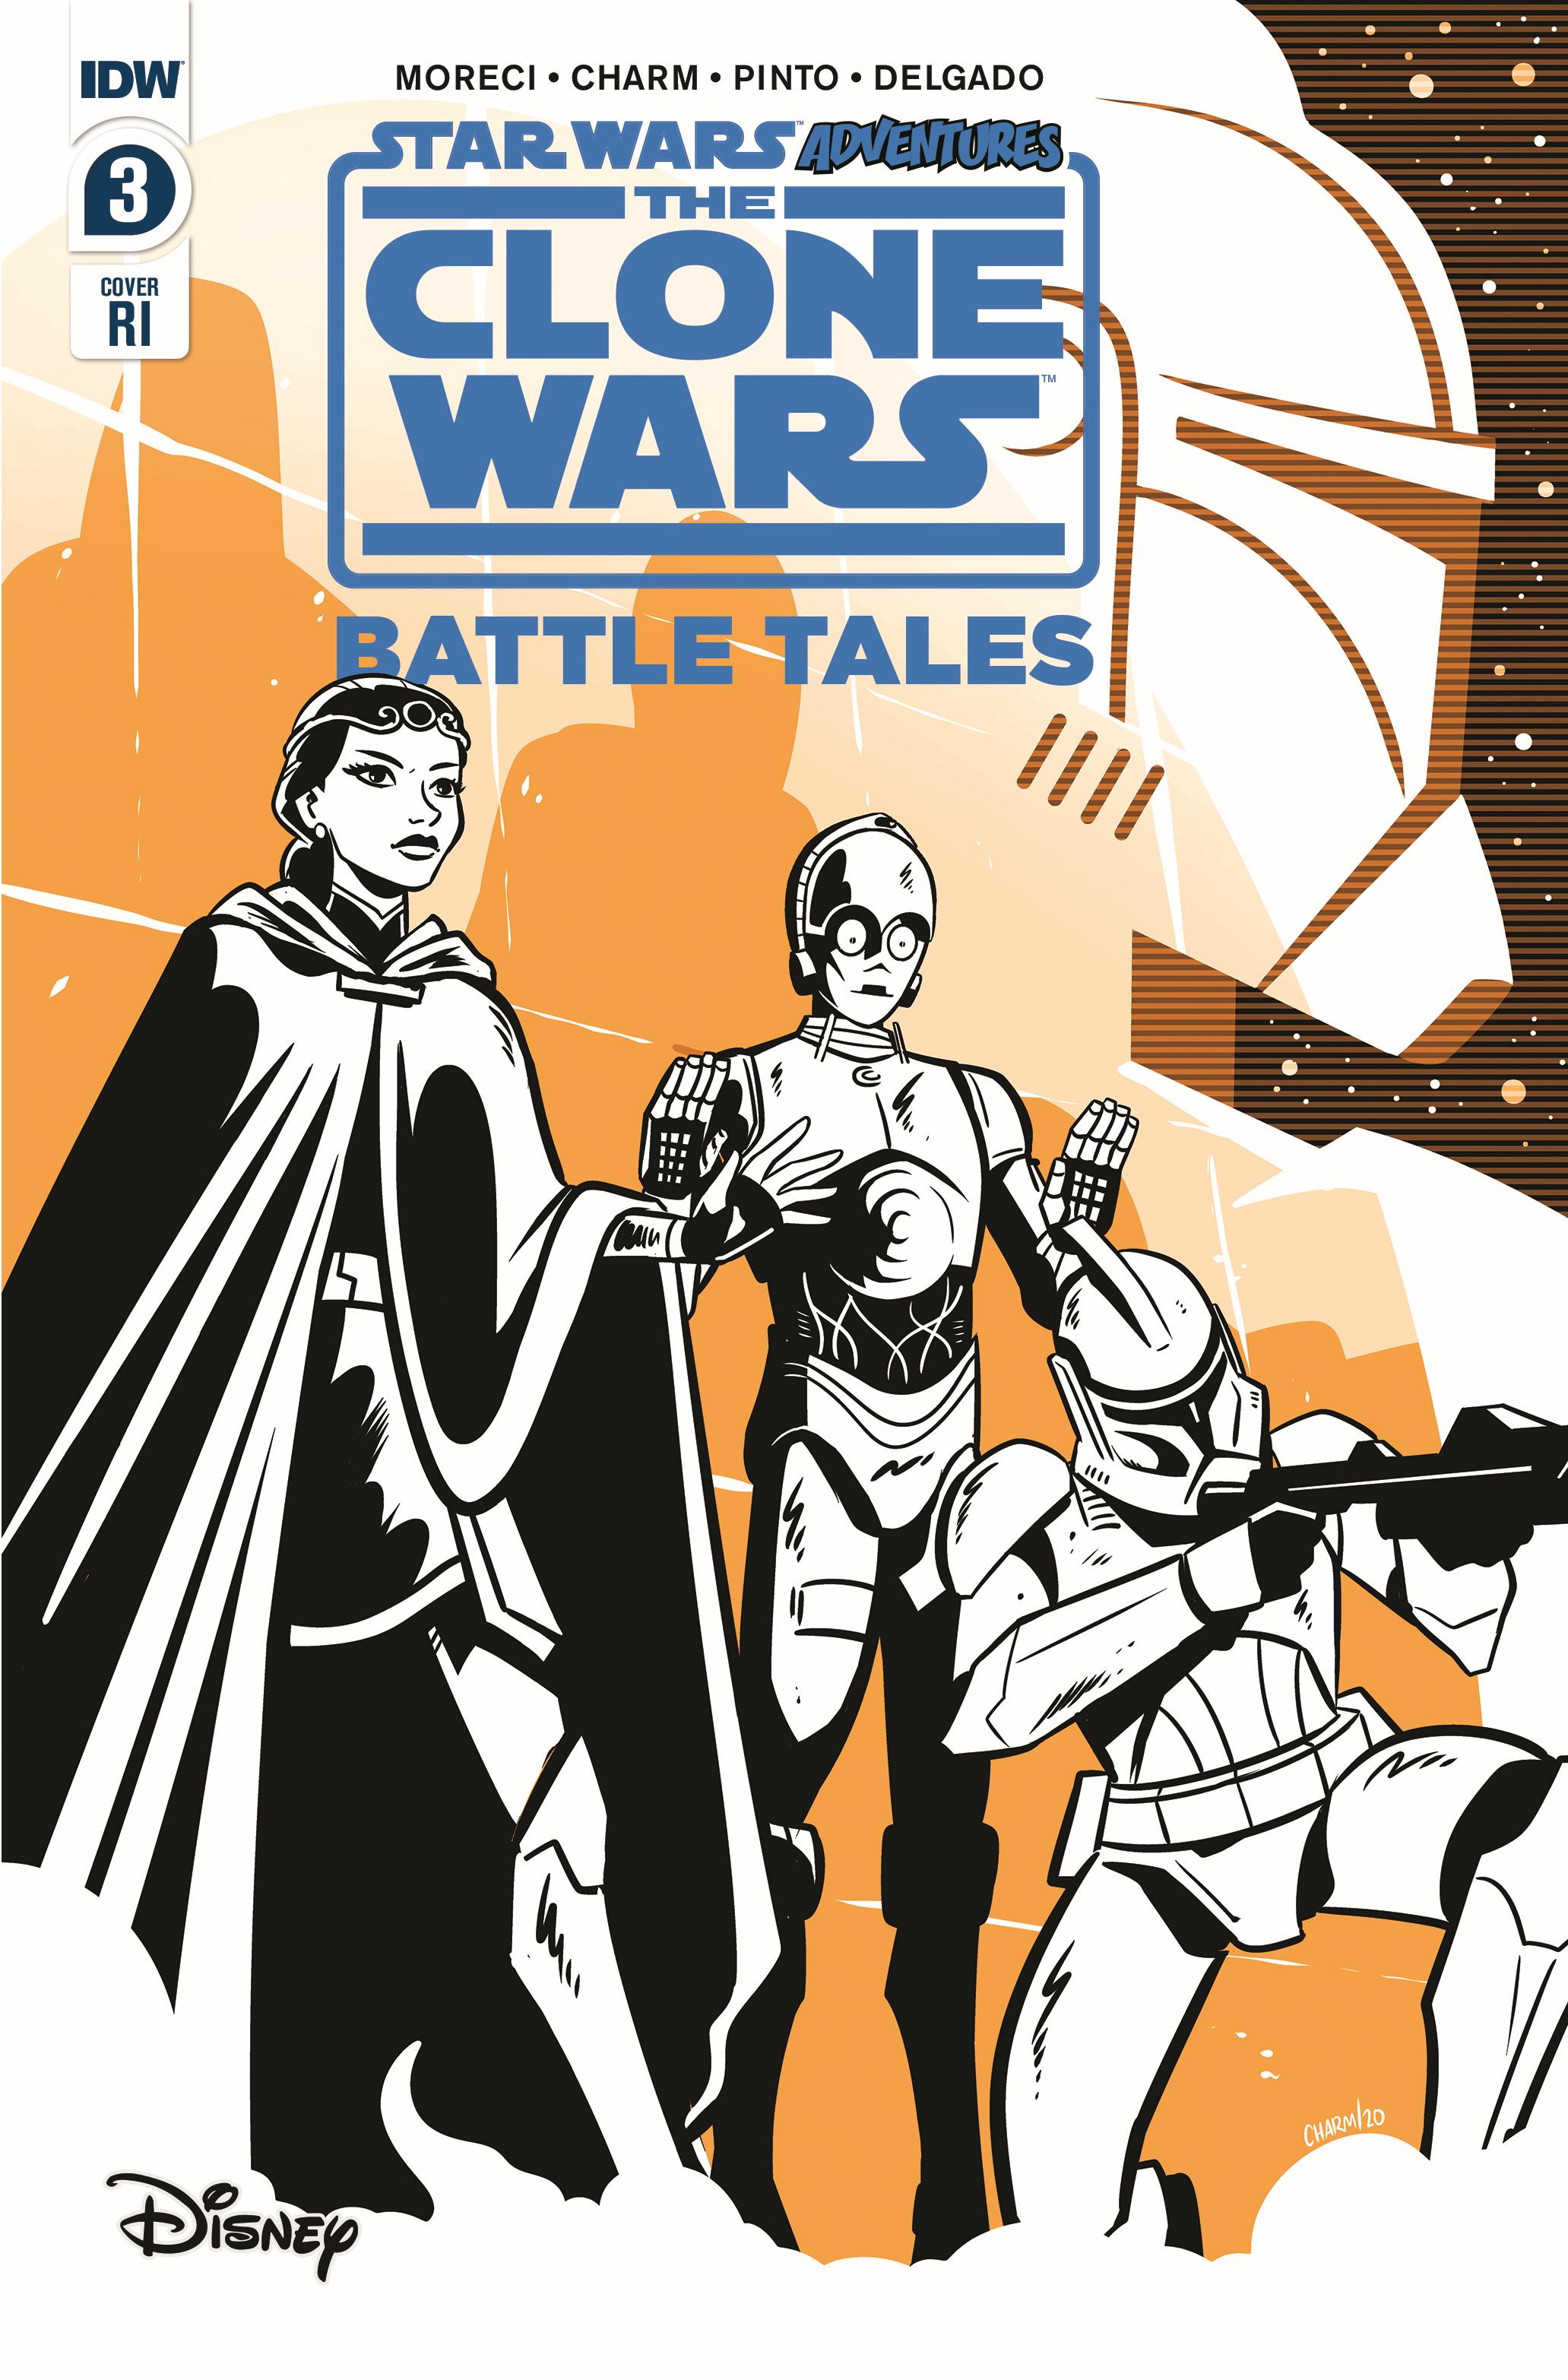 The Clone Wars - Battle Tales #3 (Derek Charm Variant Cover) (15.04.2020)